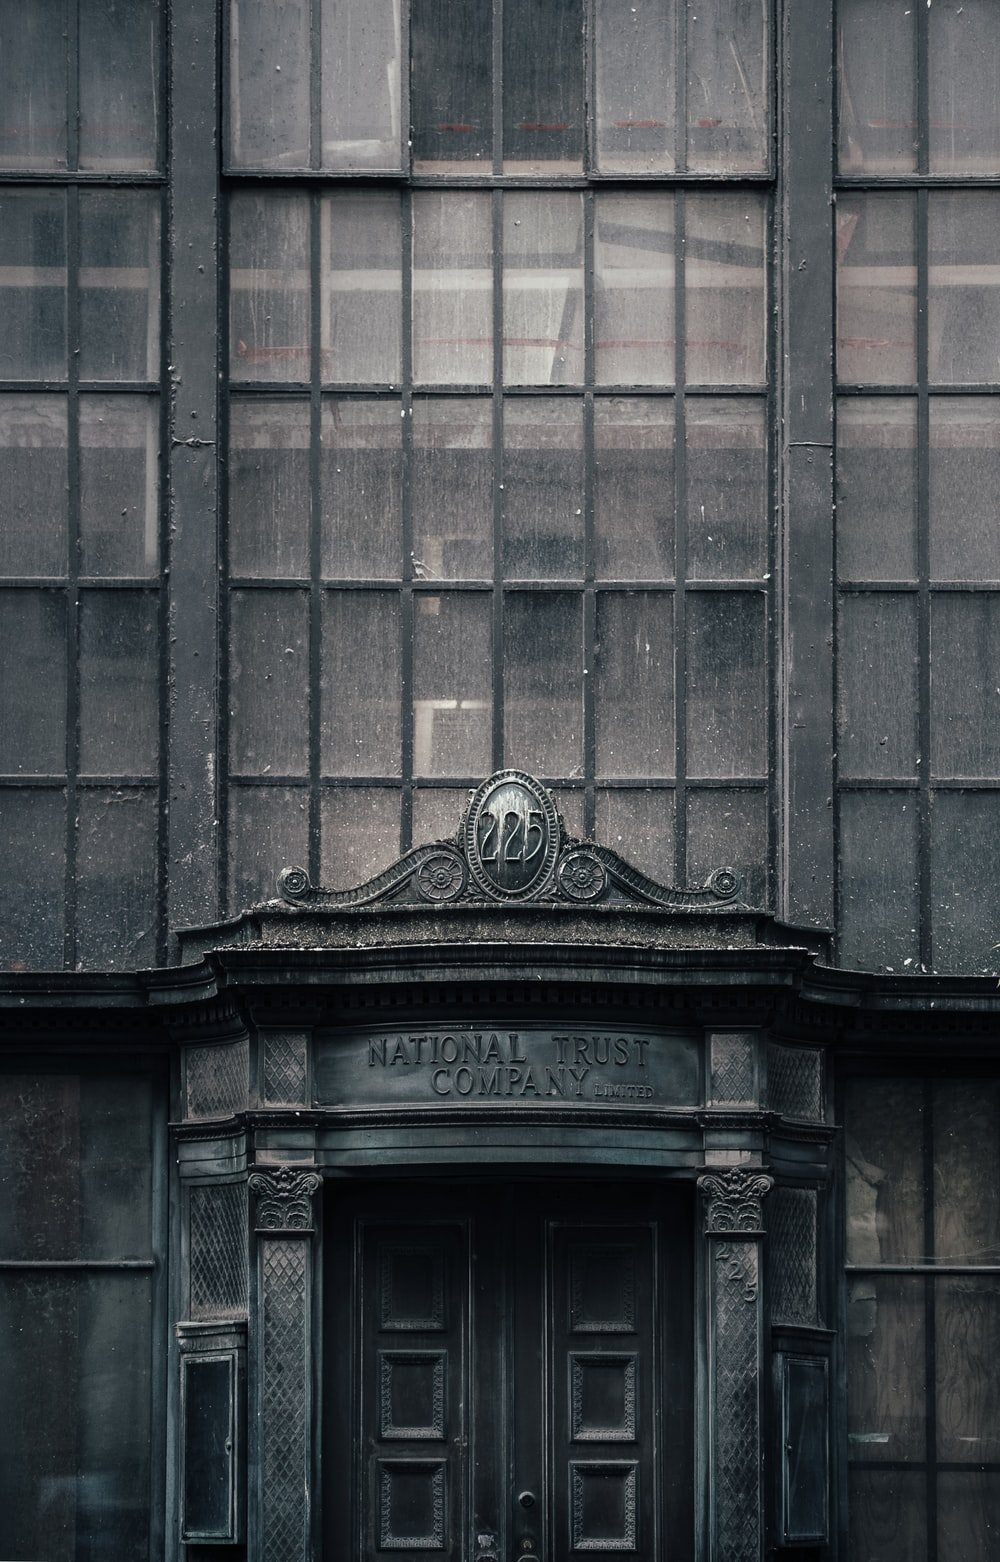 National Trust Company facade